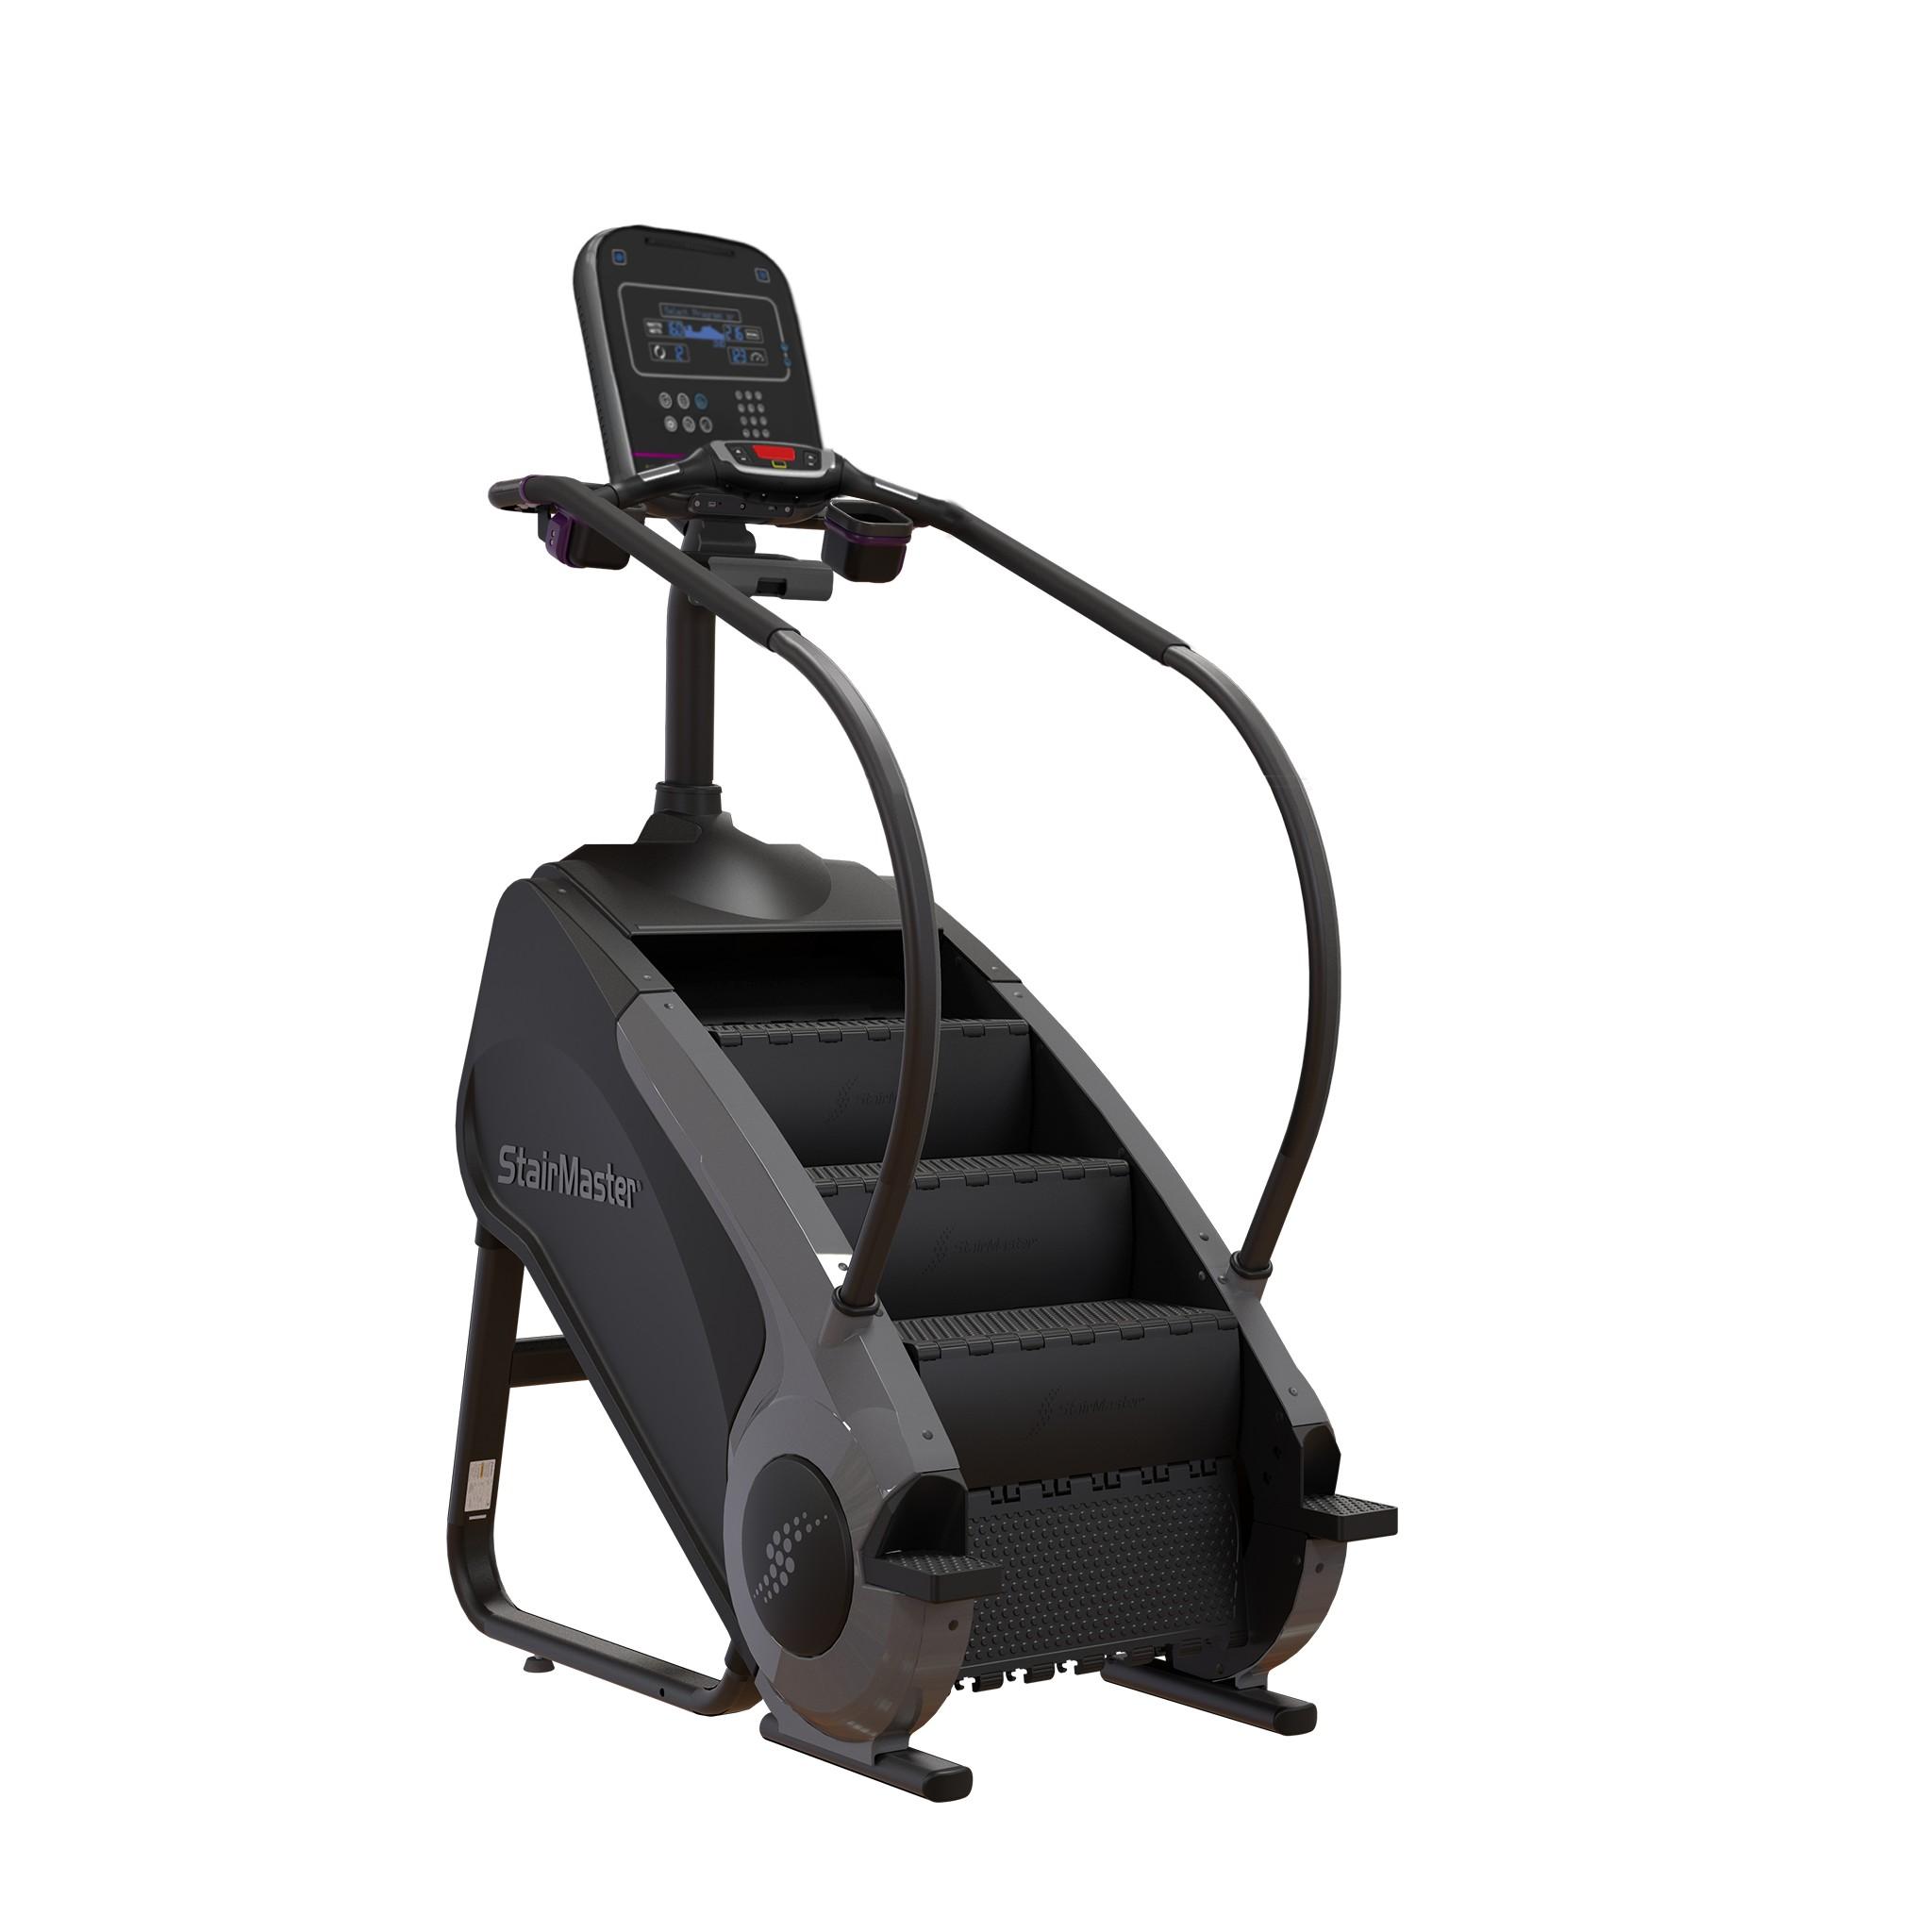 StairMaster 8 Series Gauntlet 8G LCD Display Trappemaskine